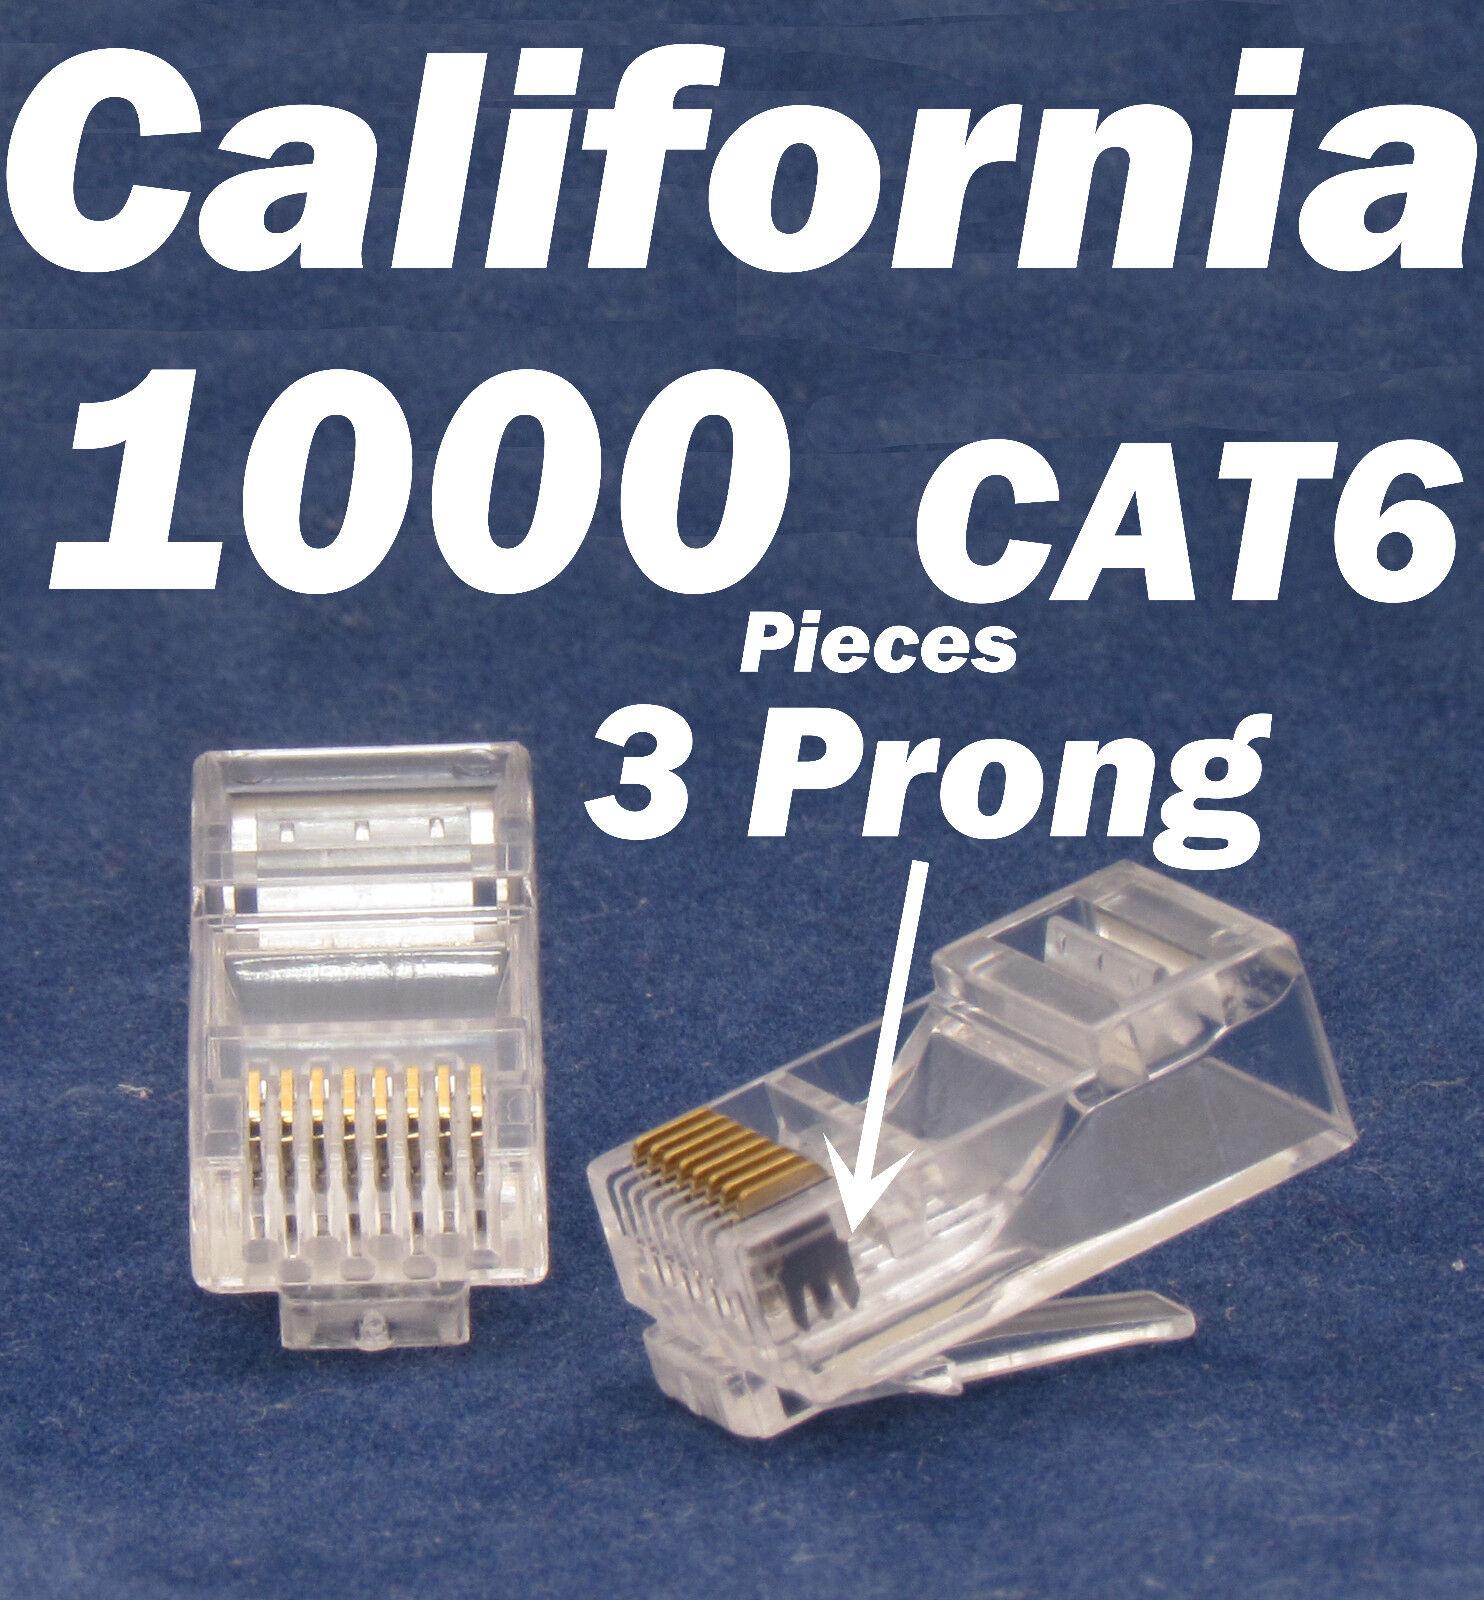 1000 X Pcs 3 Prong Teeth Rj45 8p8c Network Cable Modular ...